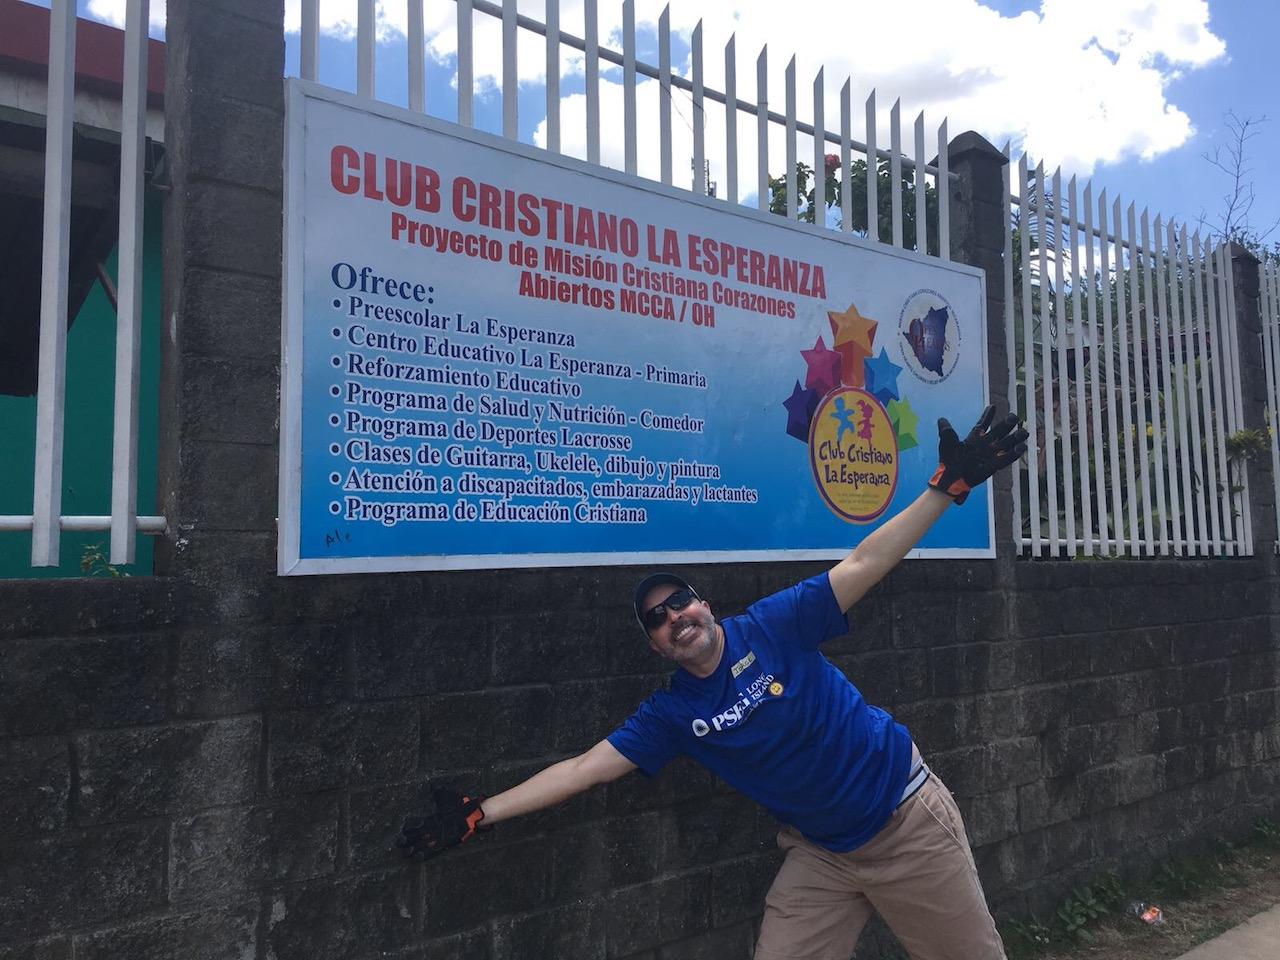 Christ-Journey-Church-IMG 6915